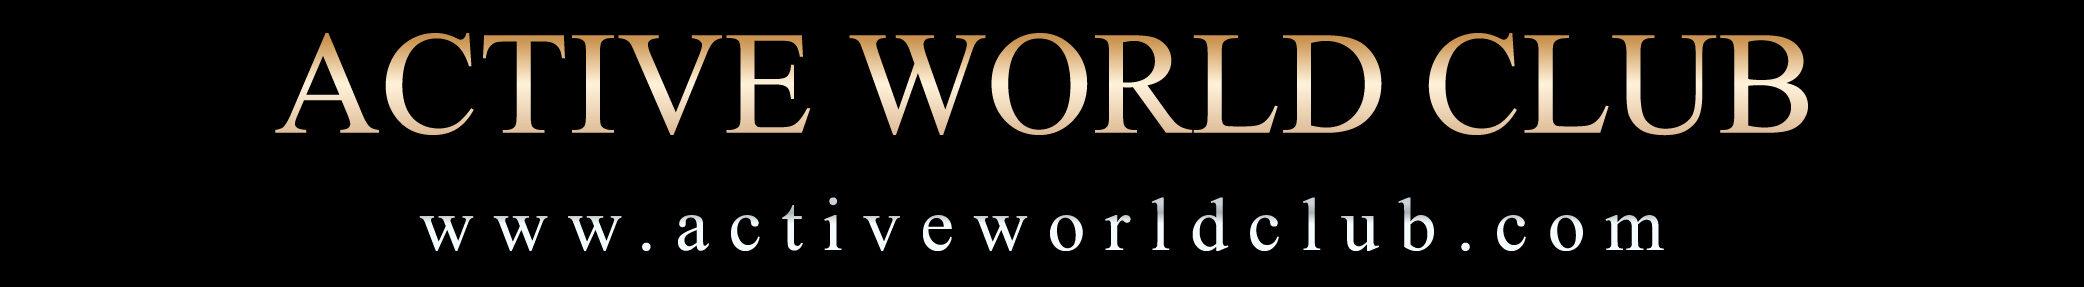 Active World Club